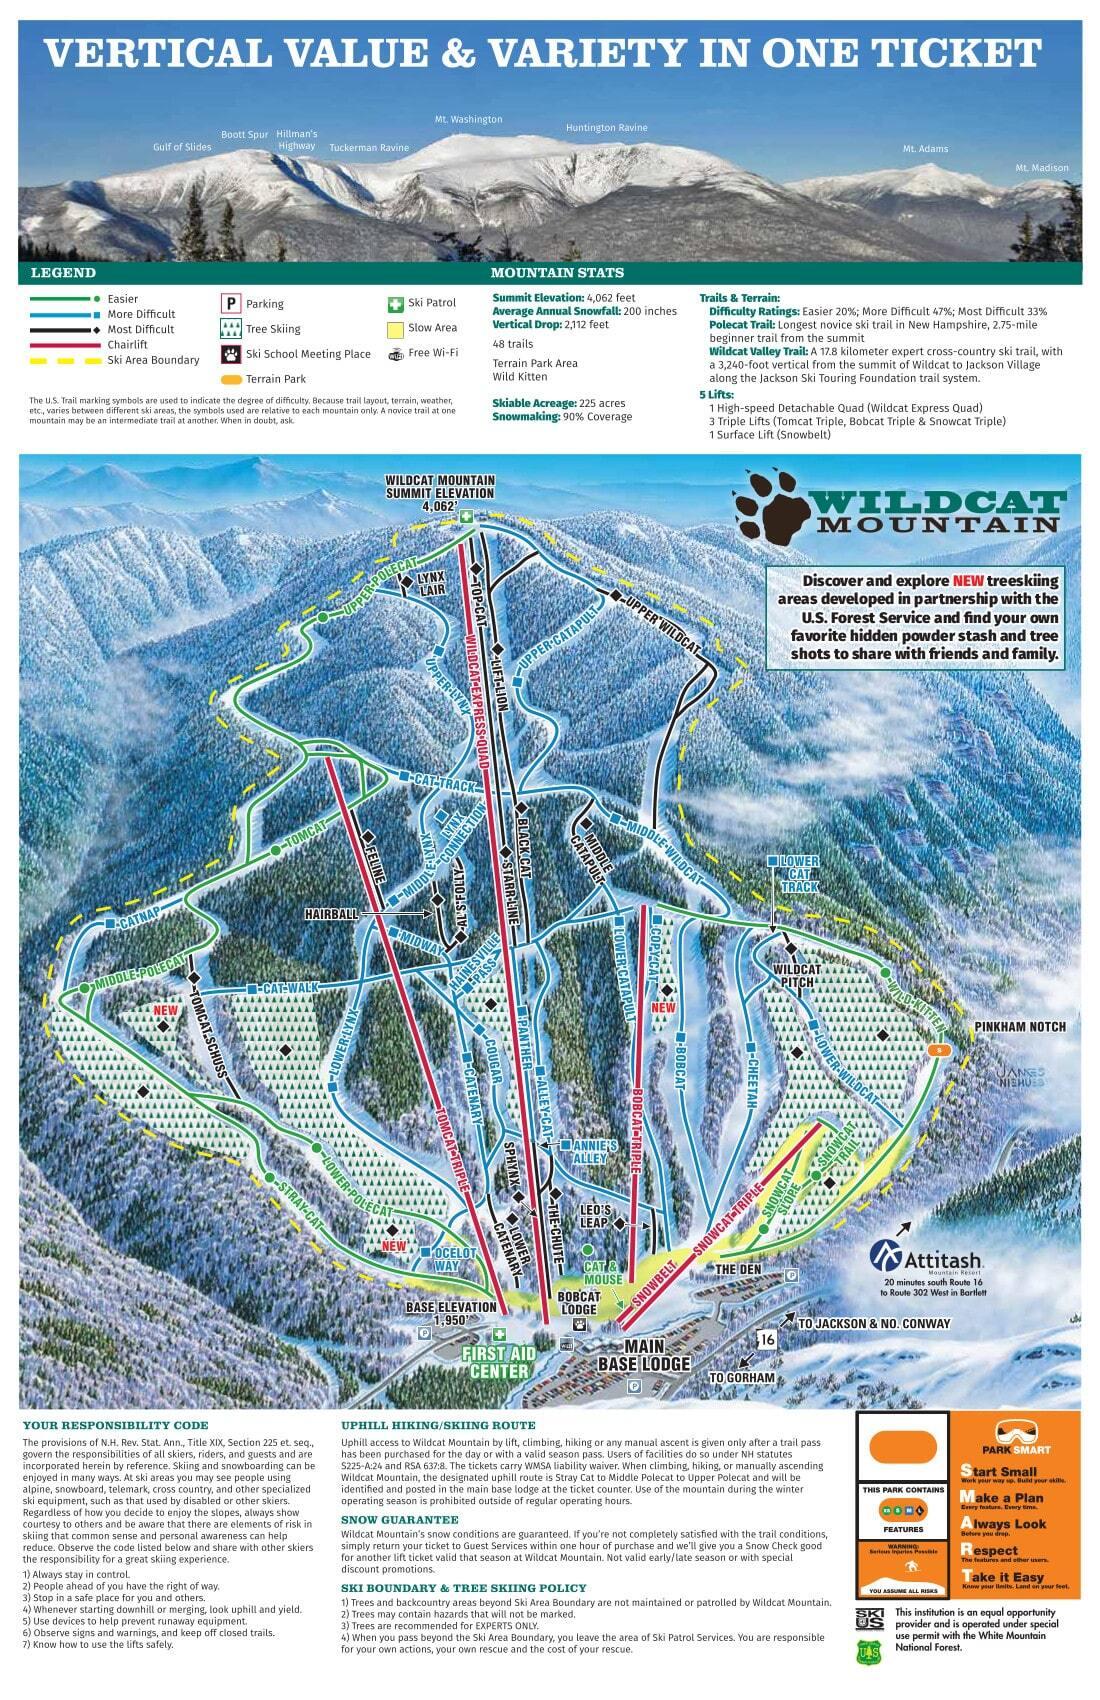 Wildcat Mountain Piste / Trail Map